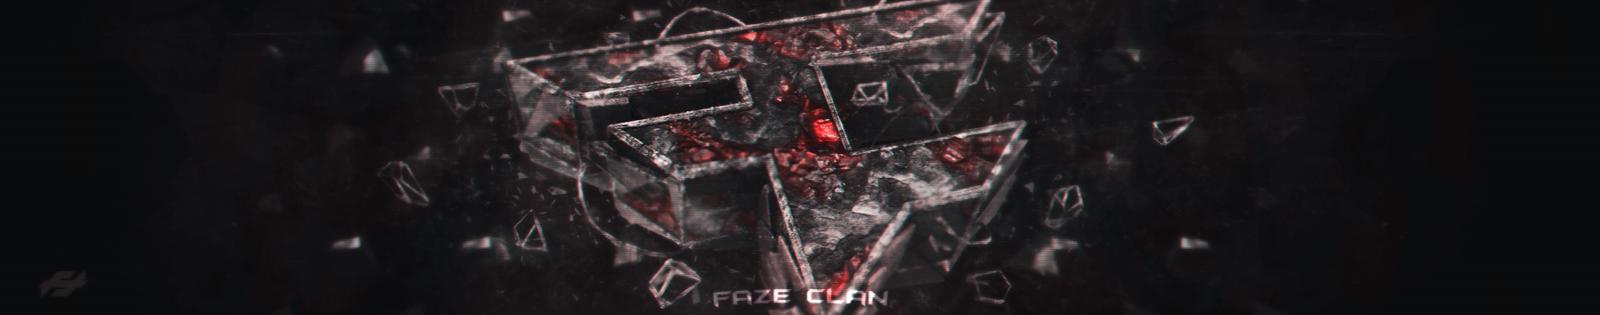 FaZe Clan by FrostMade on DeviantArt  FaZe Clan by Fr...